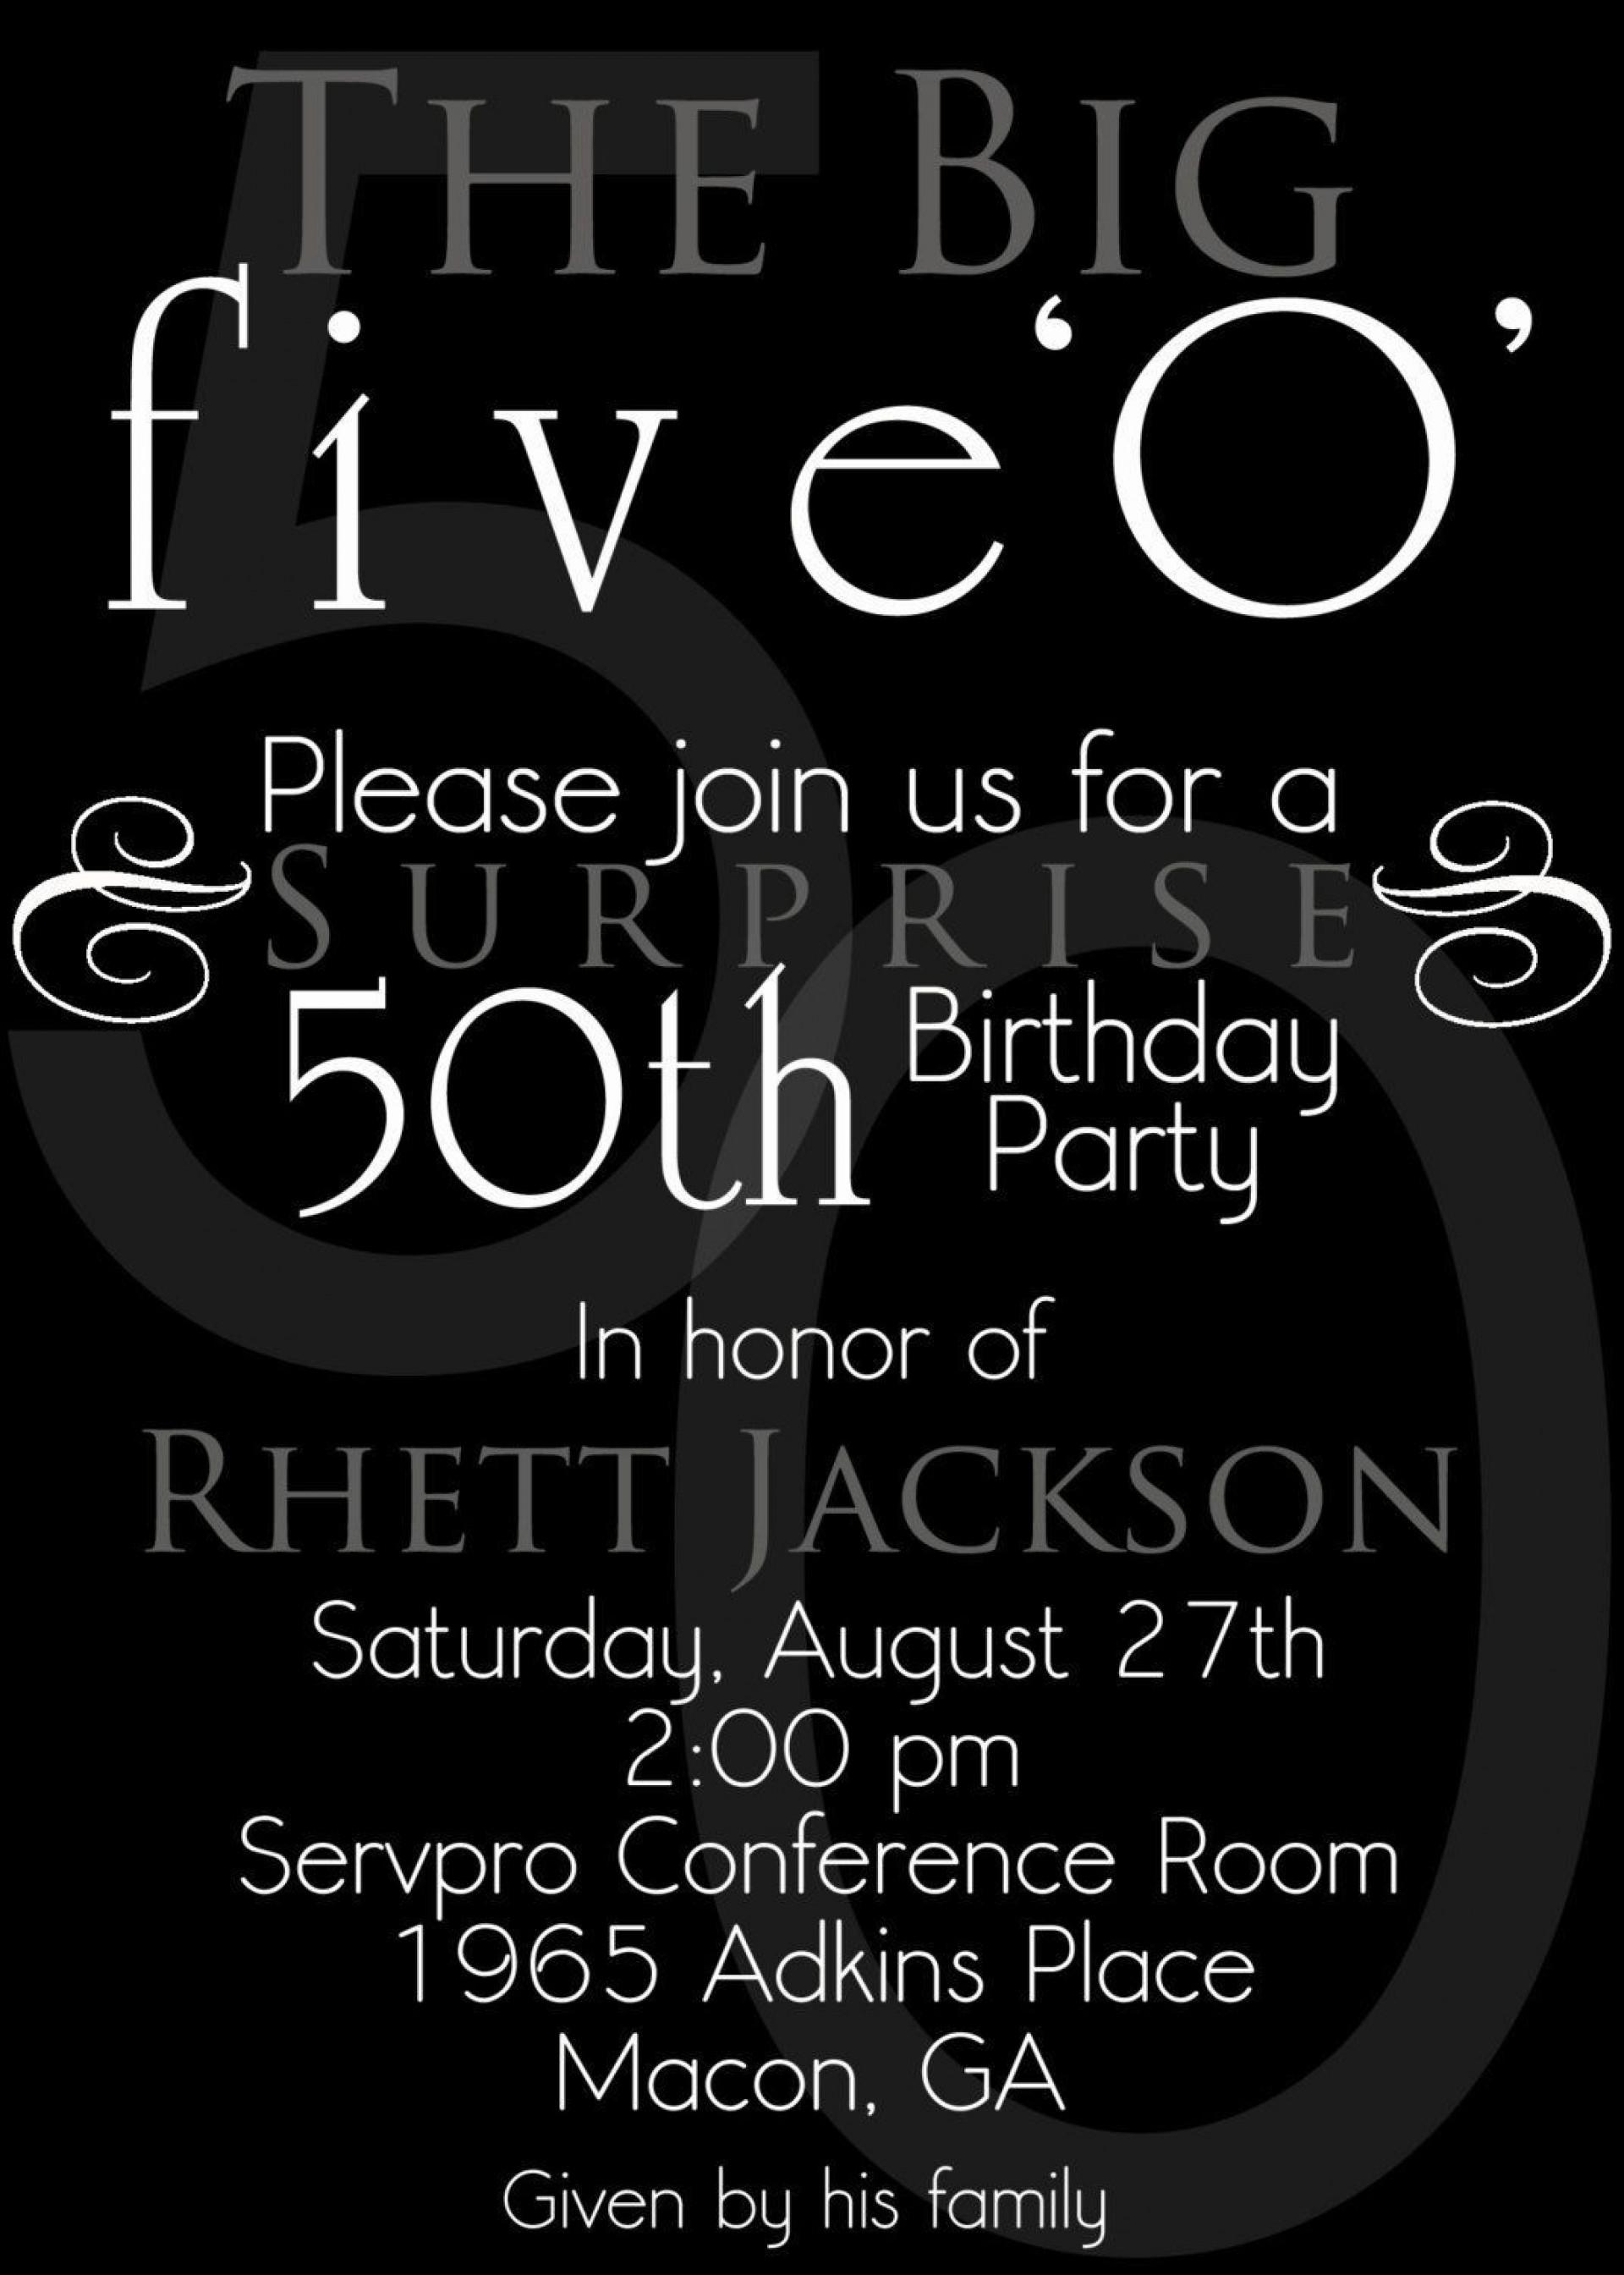 003 Sensational Surprise 50th Birthday Invitation Template Word Free Inspiration 1920